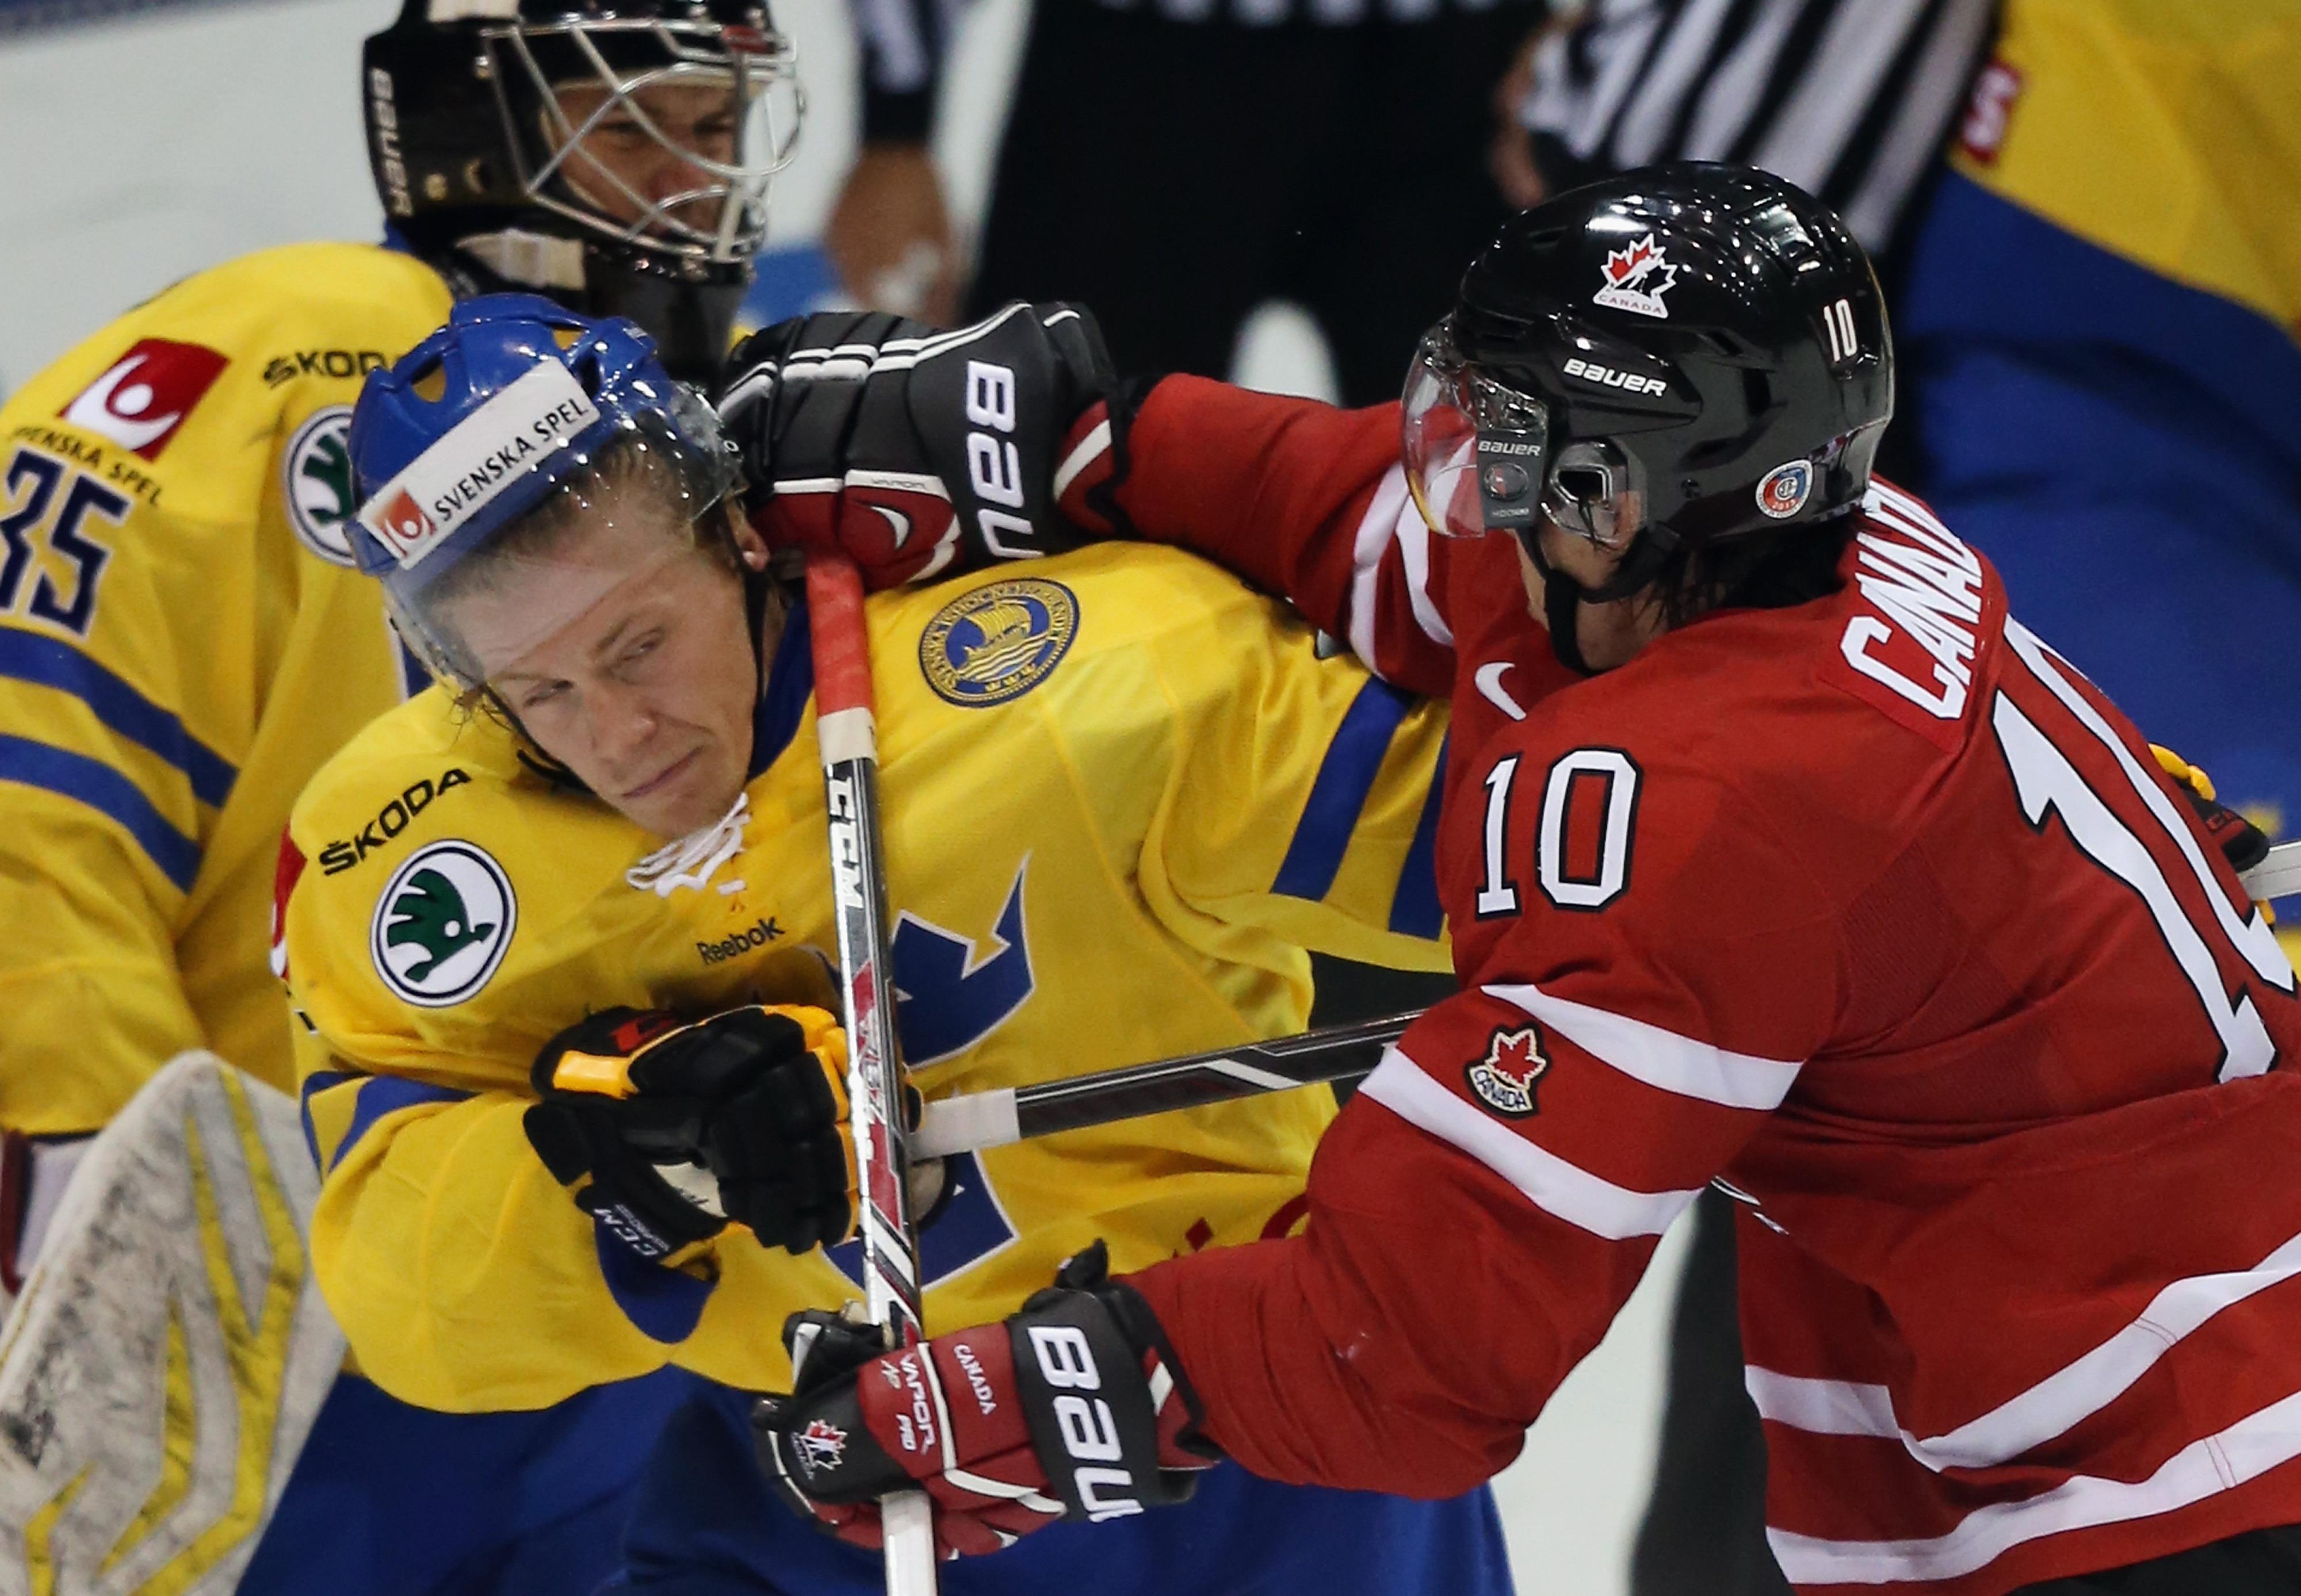 He's the Swedish guy ^^^